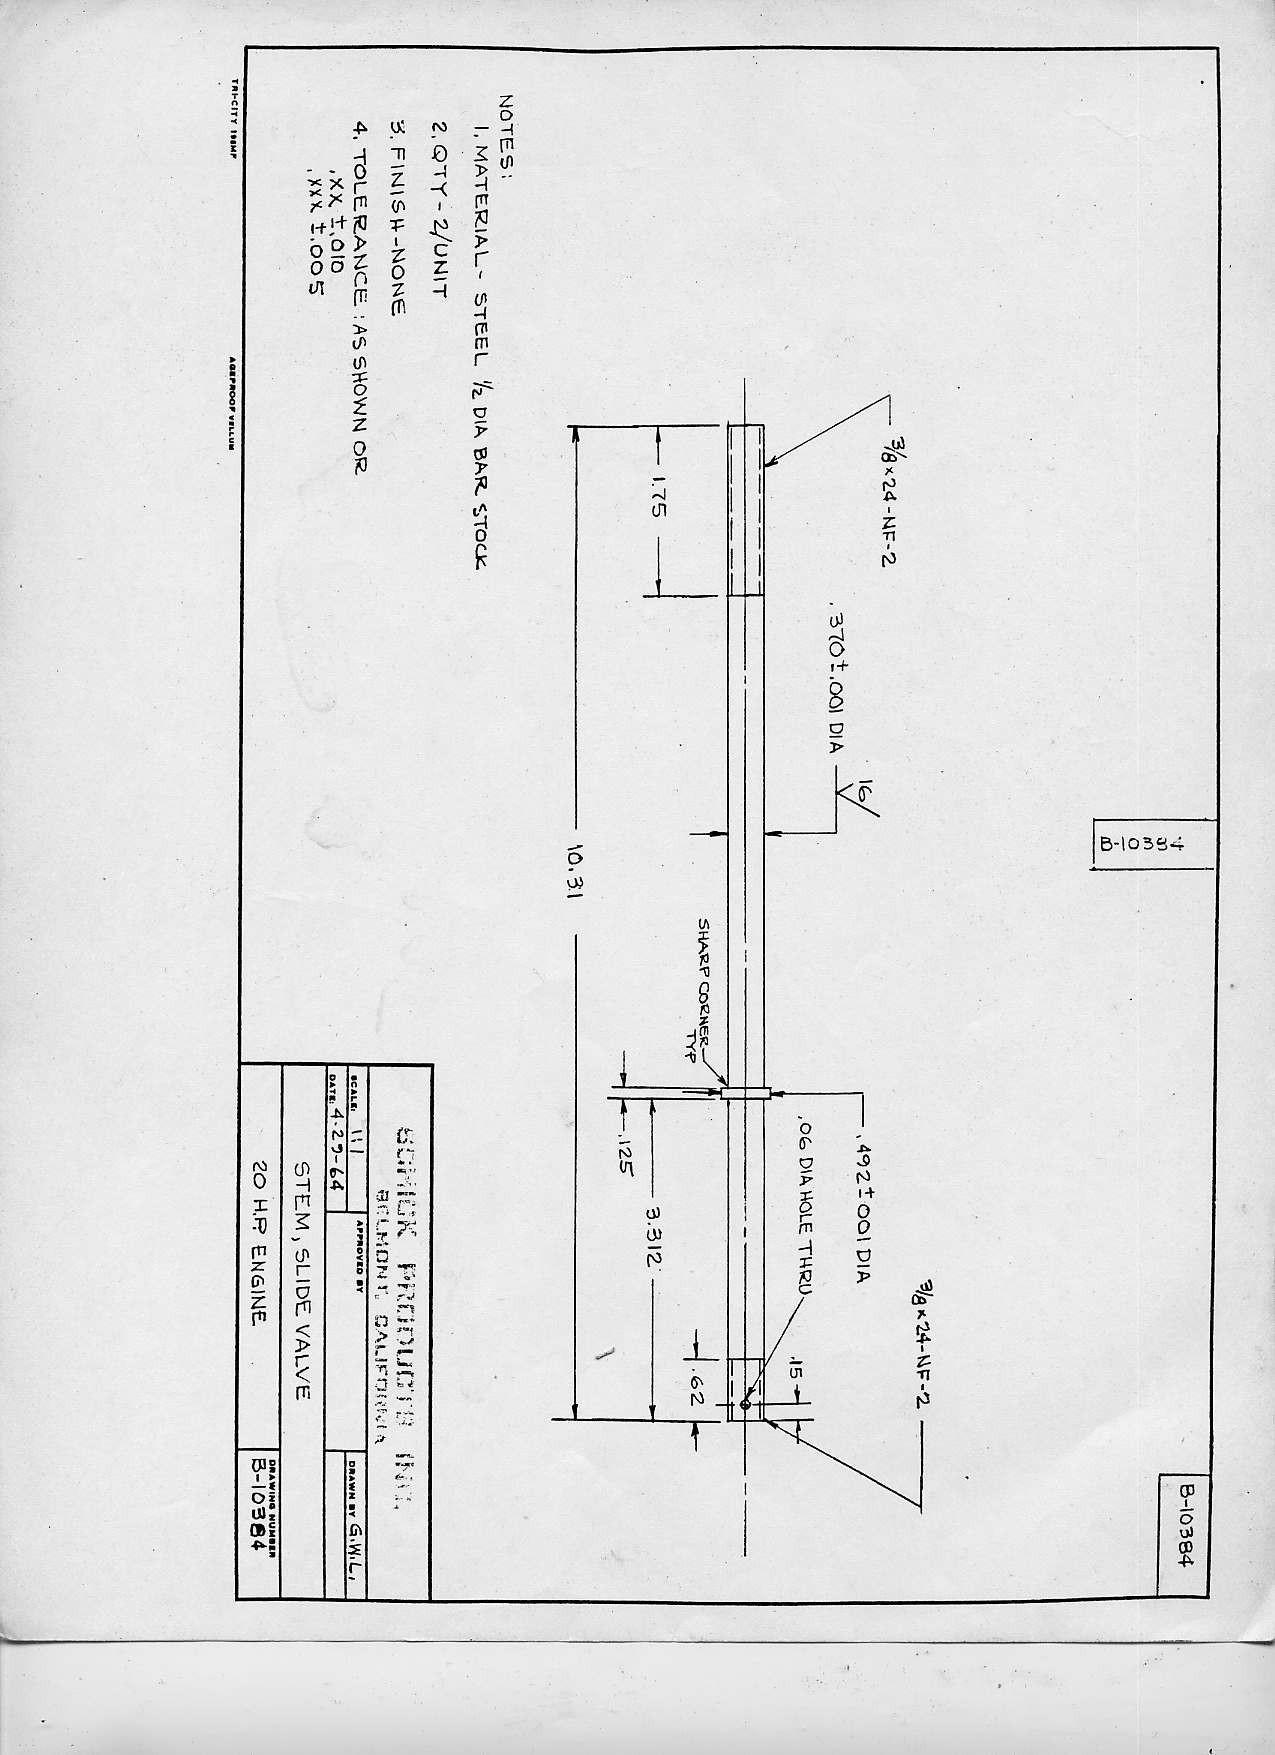 Steam Engine Diagram Animation Simple Slide Valve Design for Model Steam Engine Of Steam Engine Diagram Animation